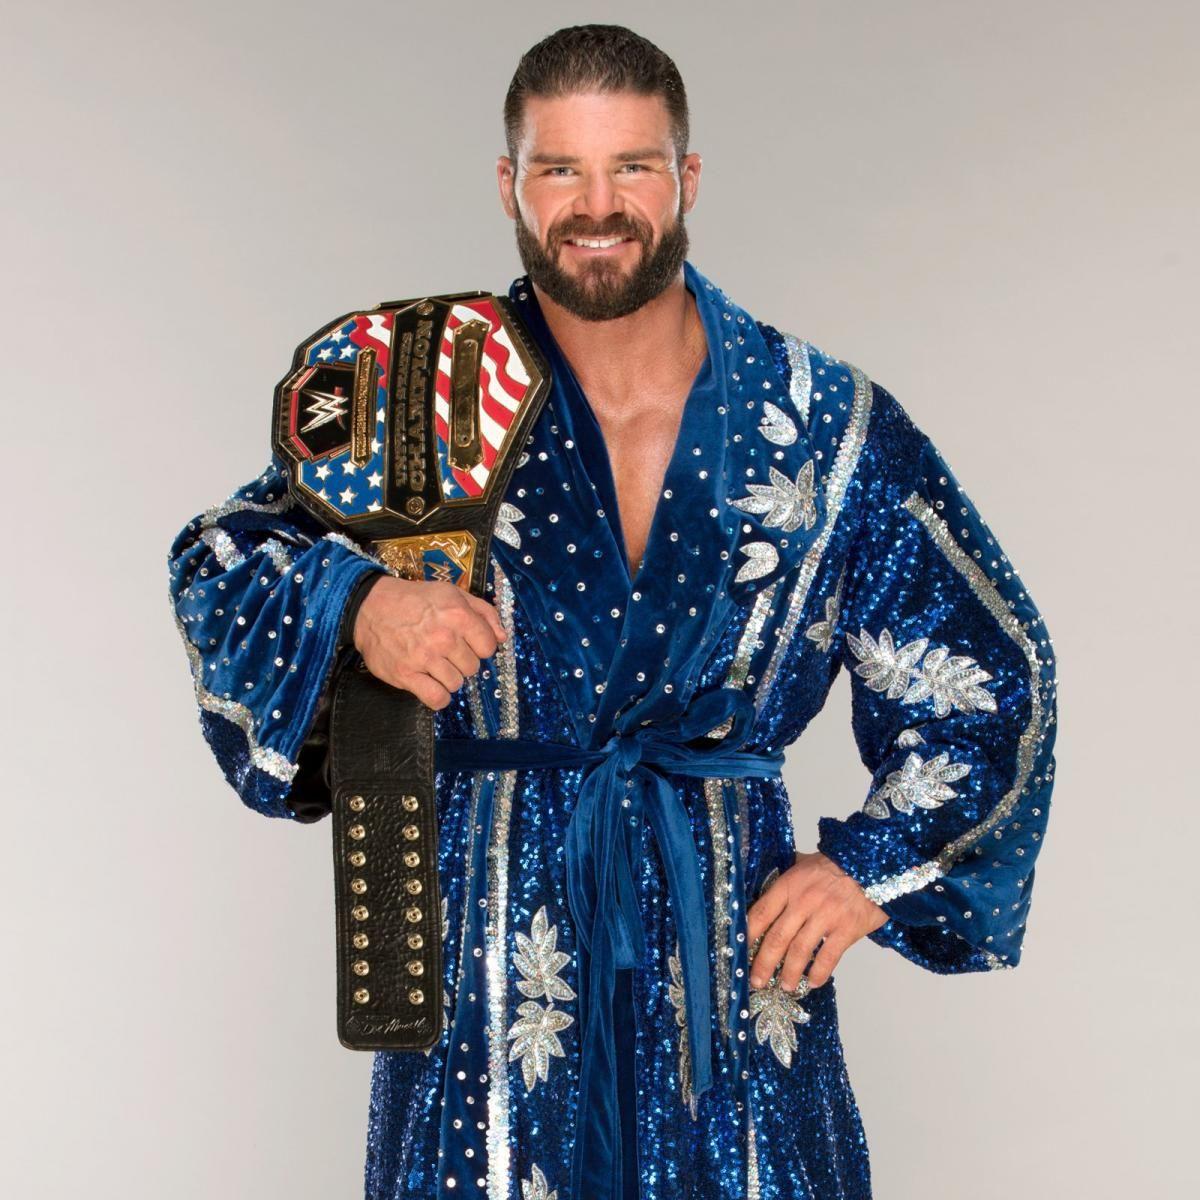 Photos Riddle Enters The Hall Of U S Champions Wwe United States Championship John Cena Wwe Champion Wrestling Superstars